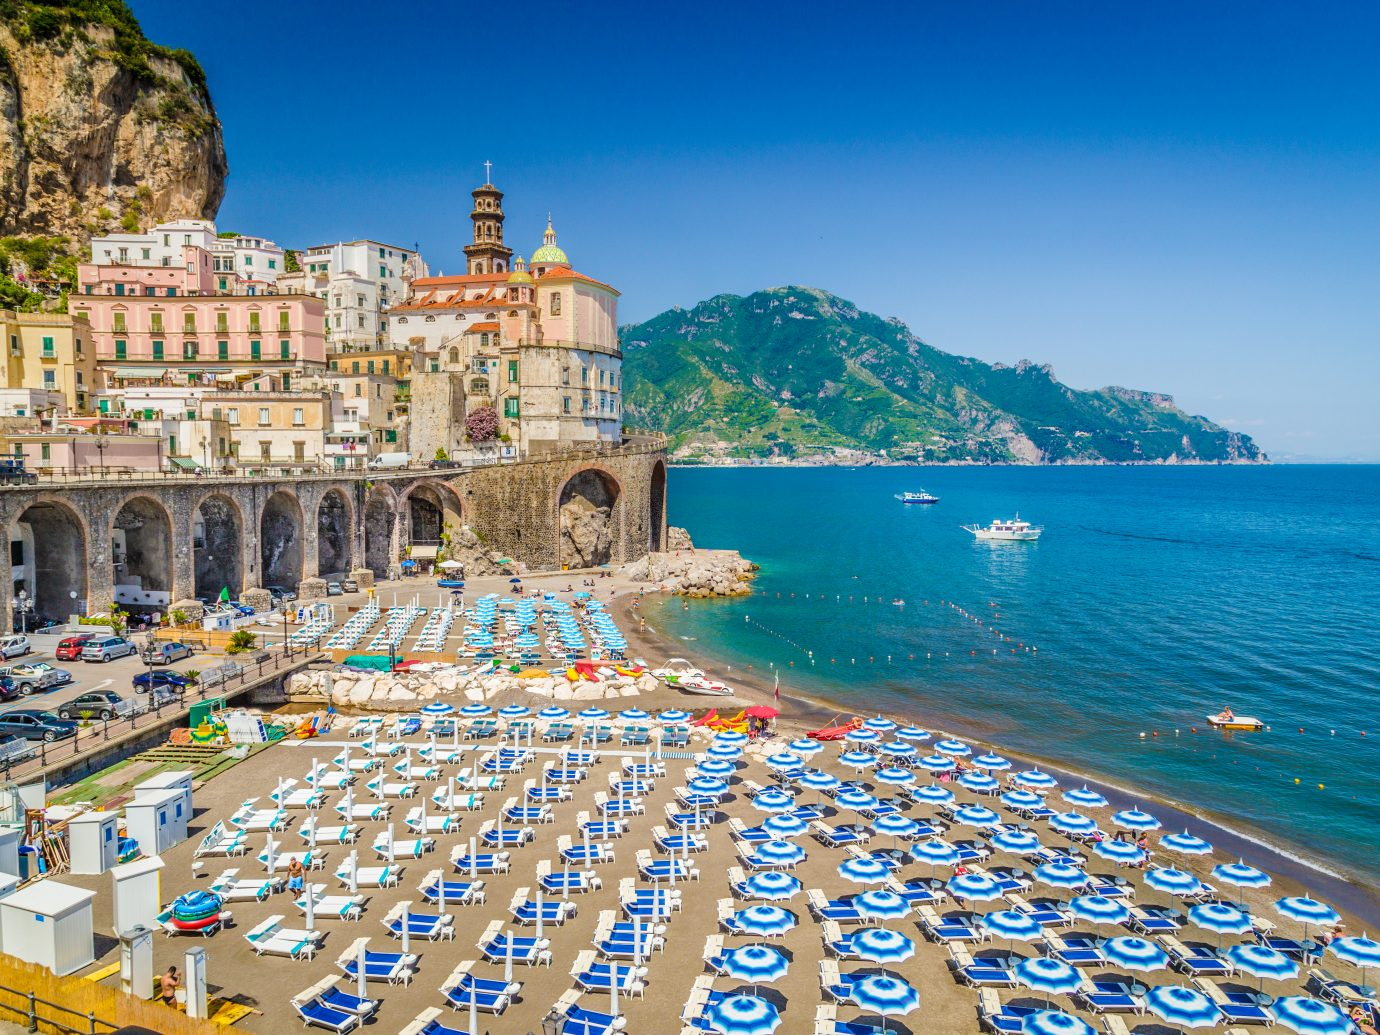 town of Atrani at famous Amalfi Coast with Gulf of Salerno, Campania, Italy.